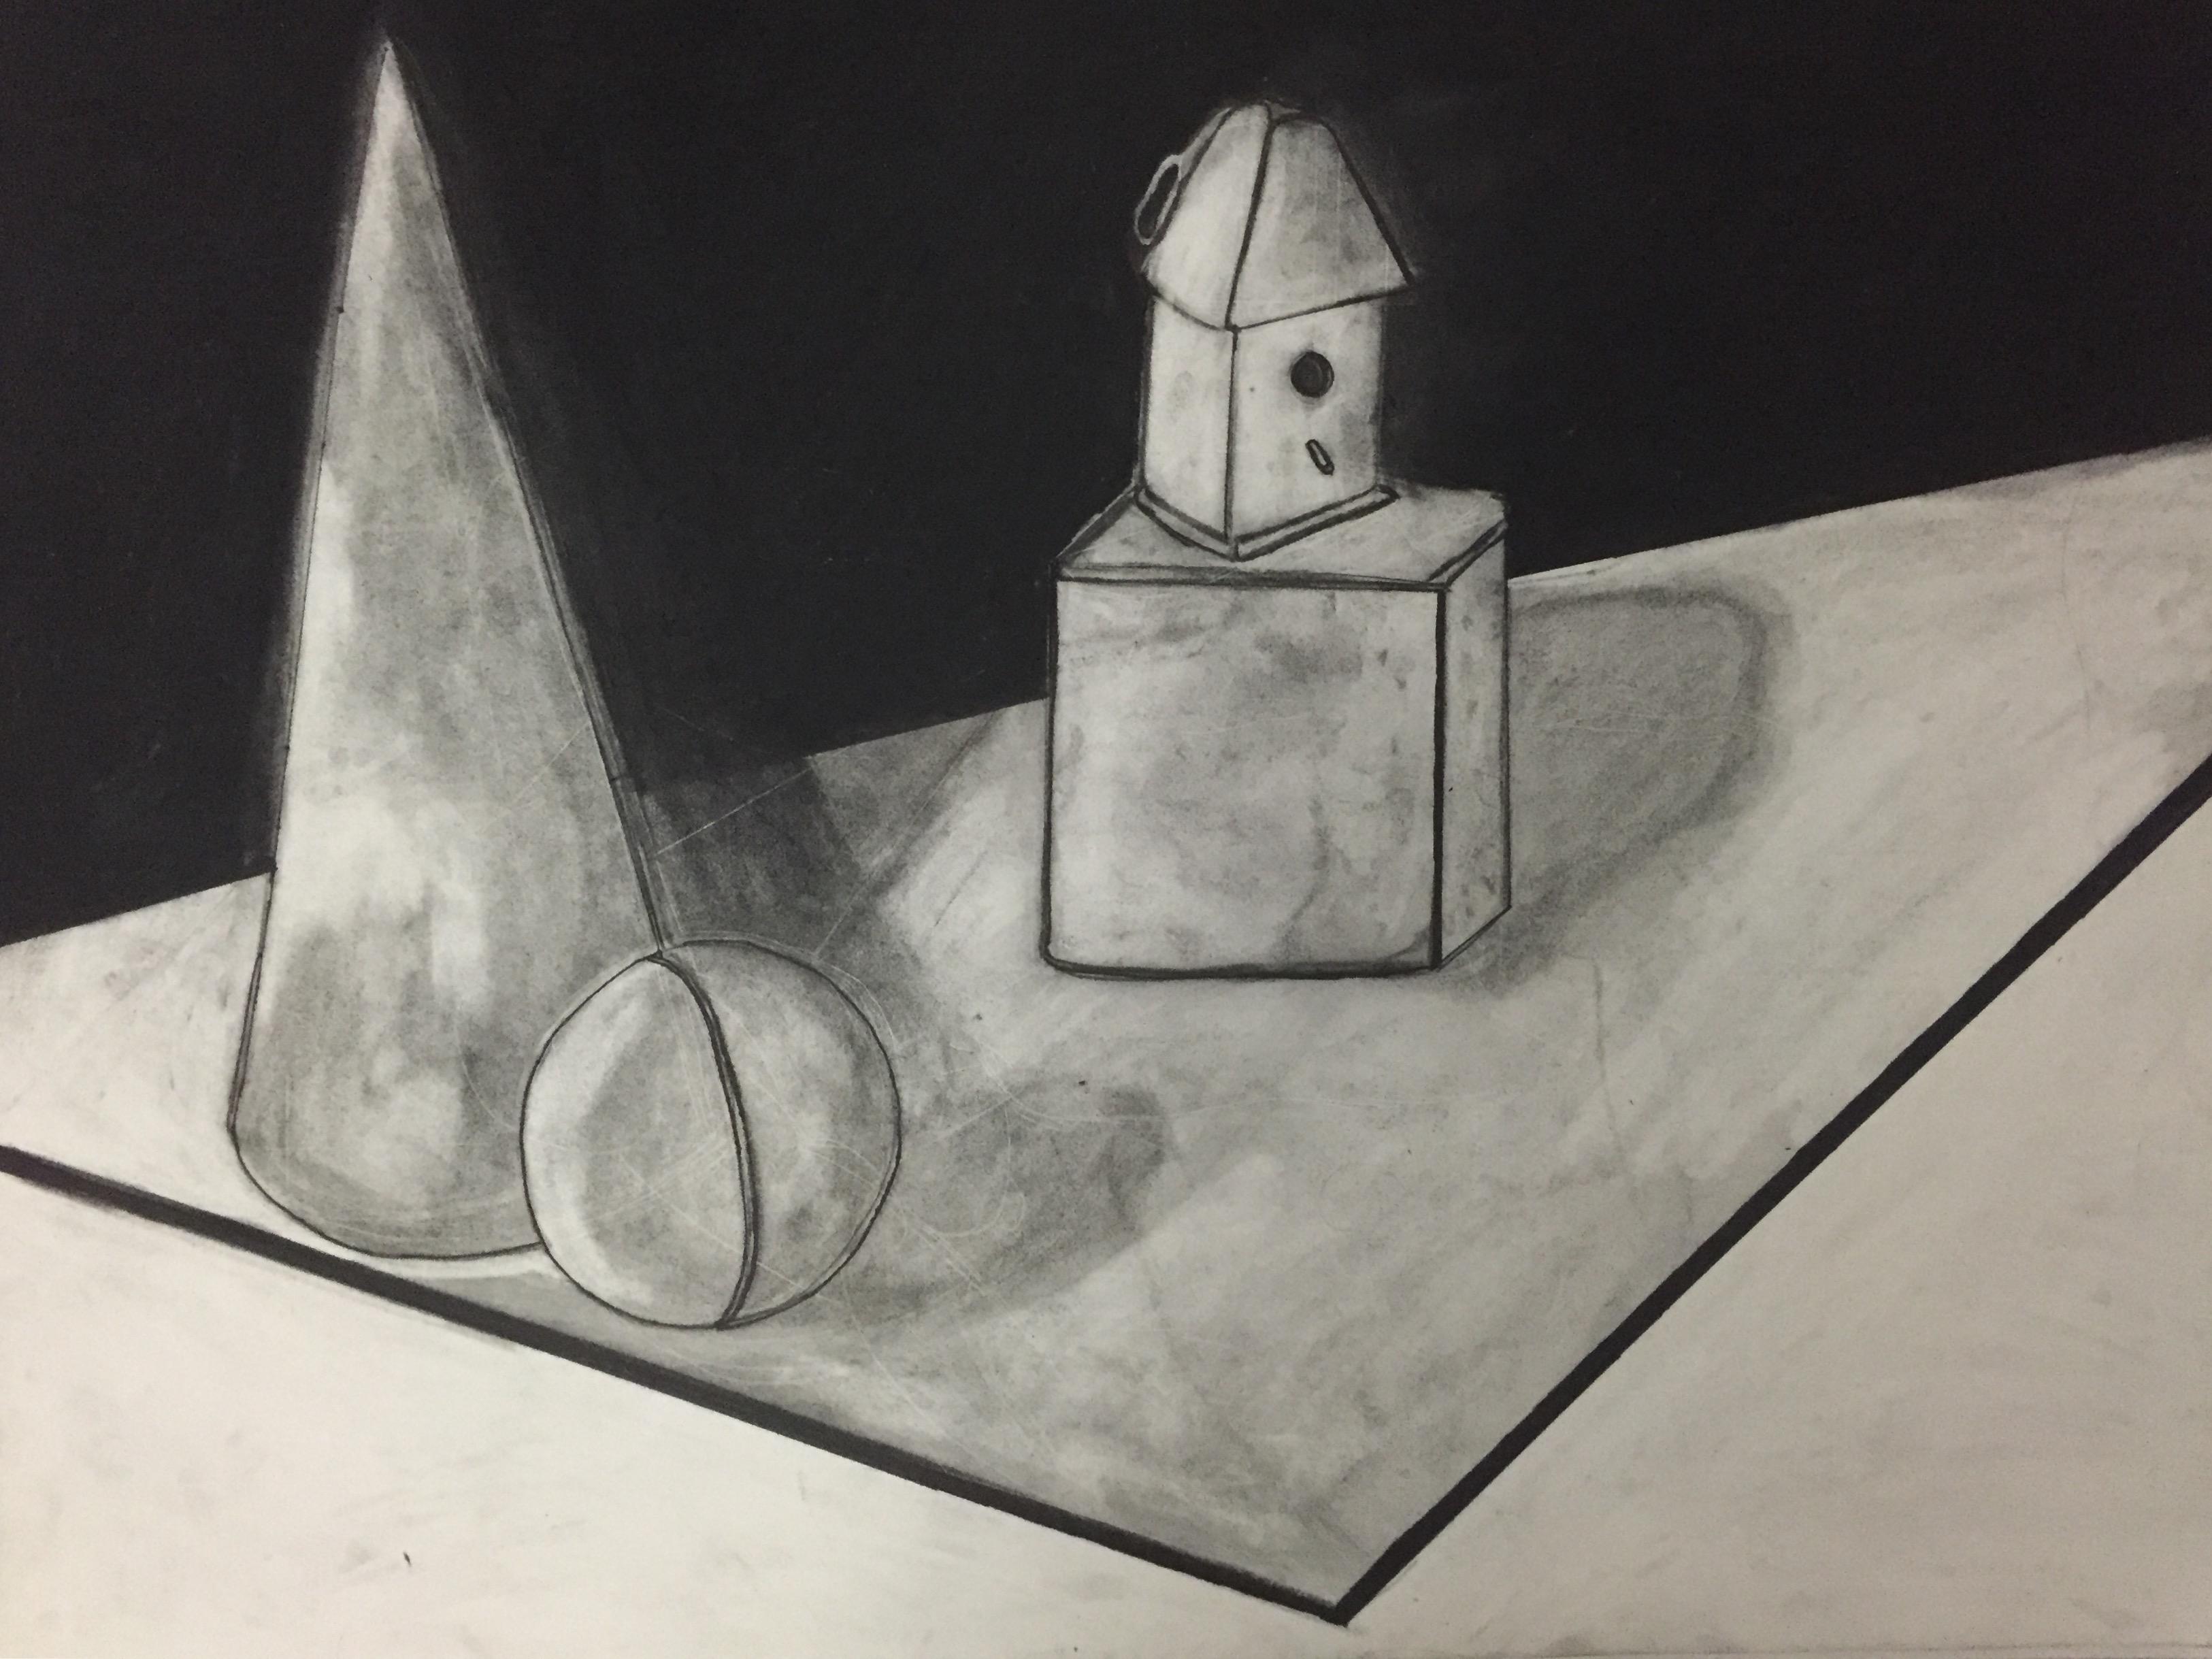 Geometrical Studies in Charcoal: Part II